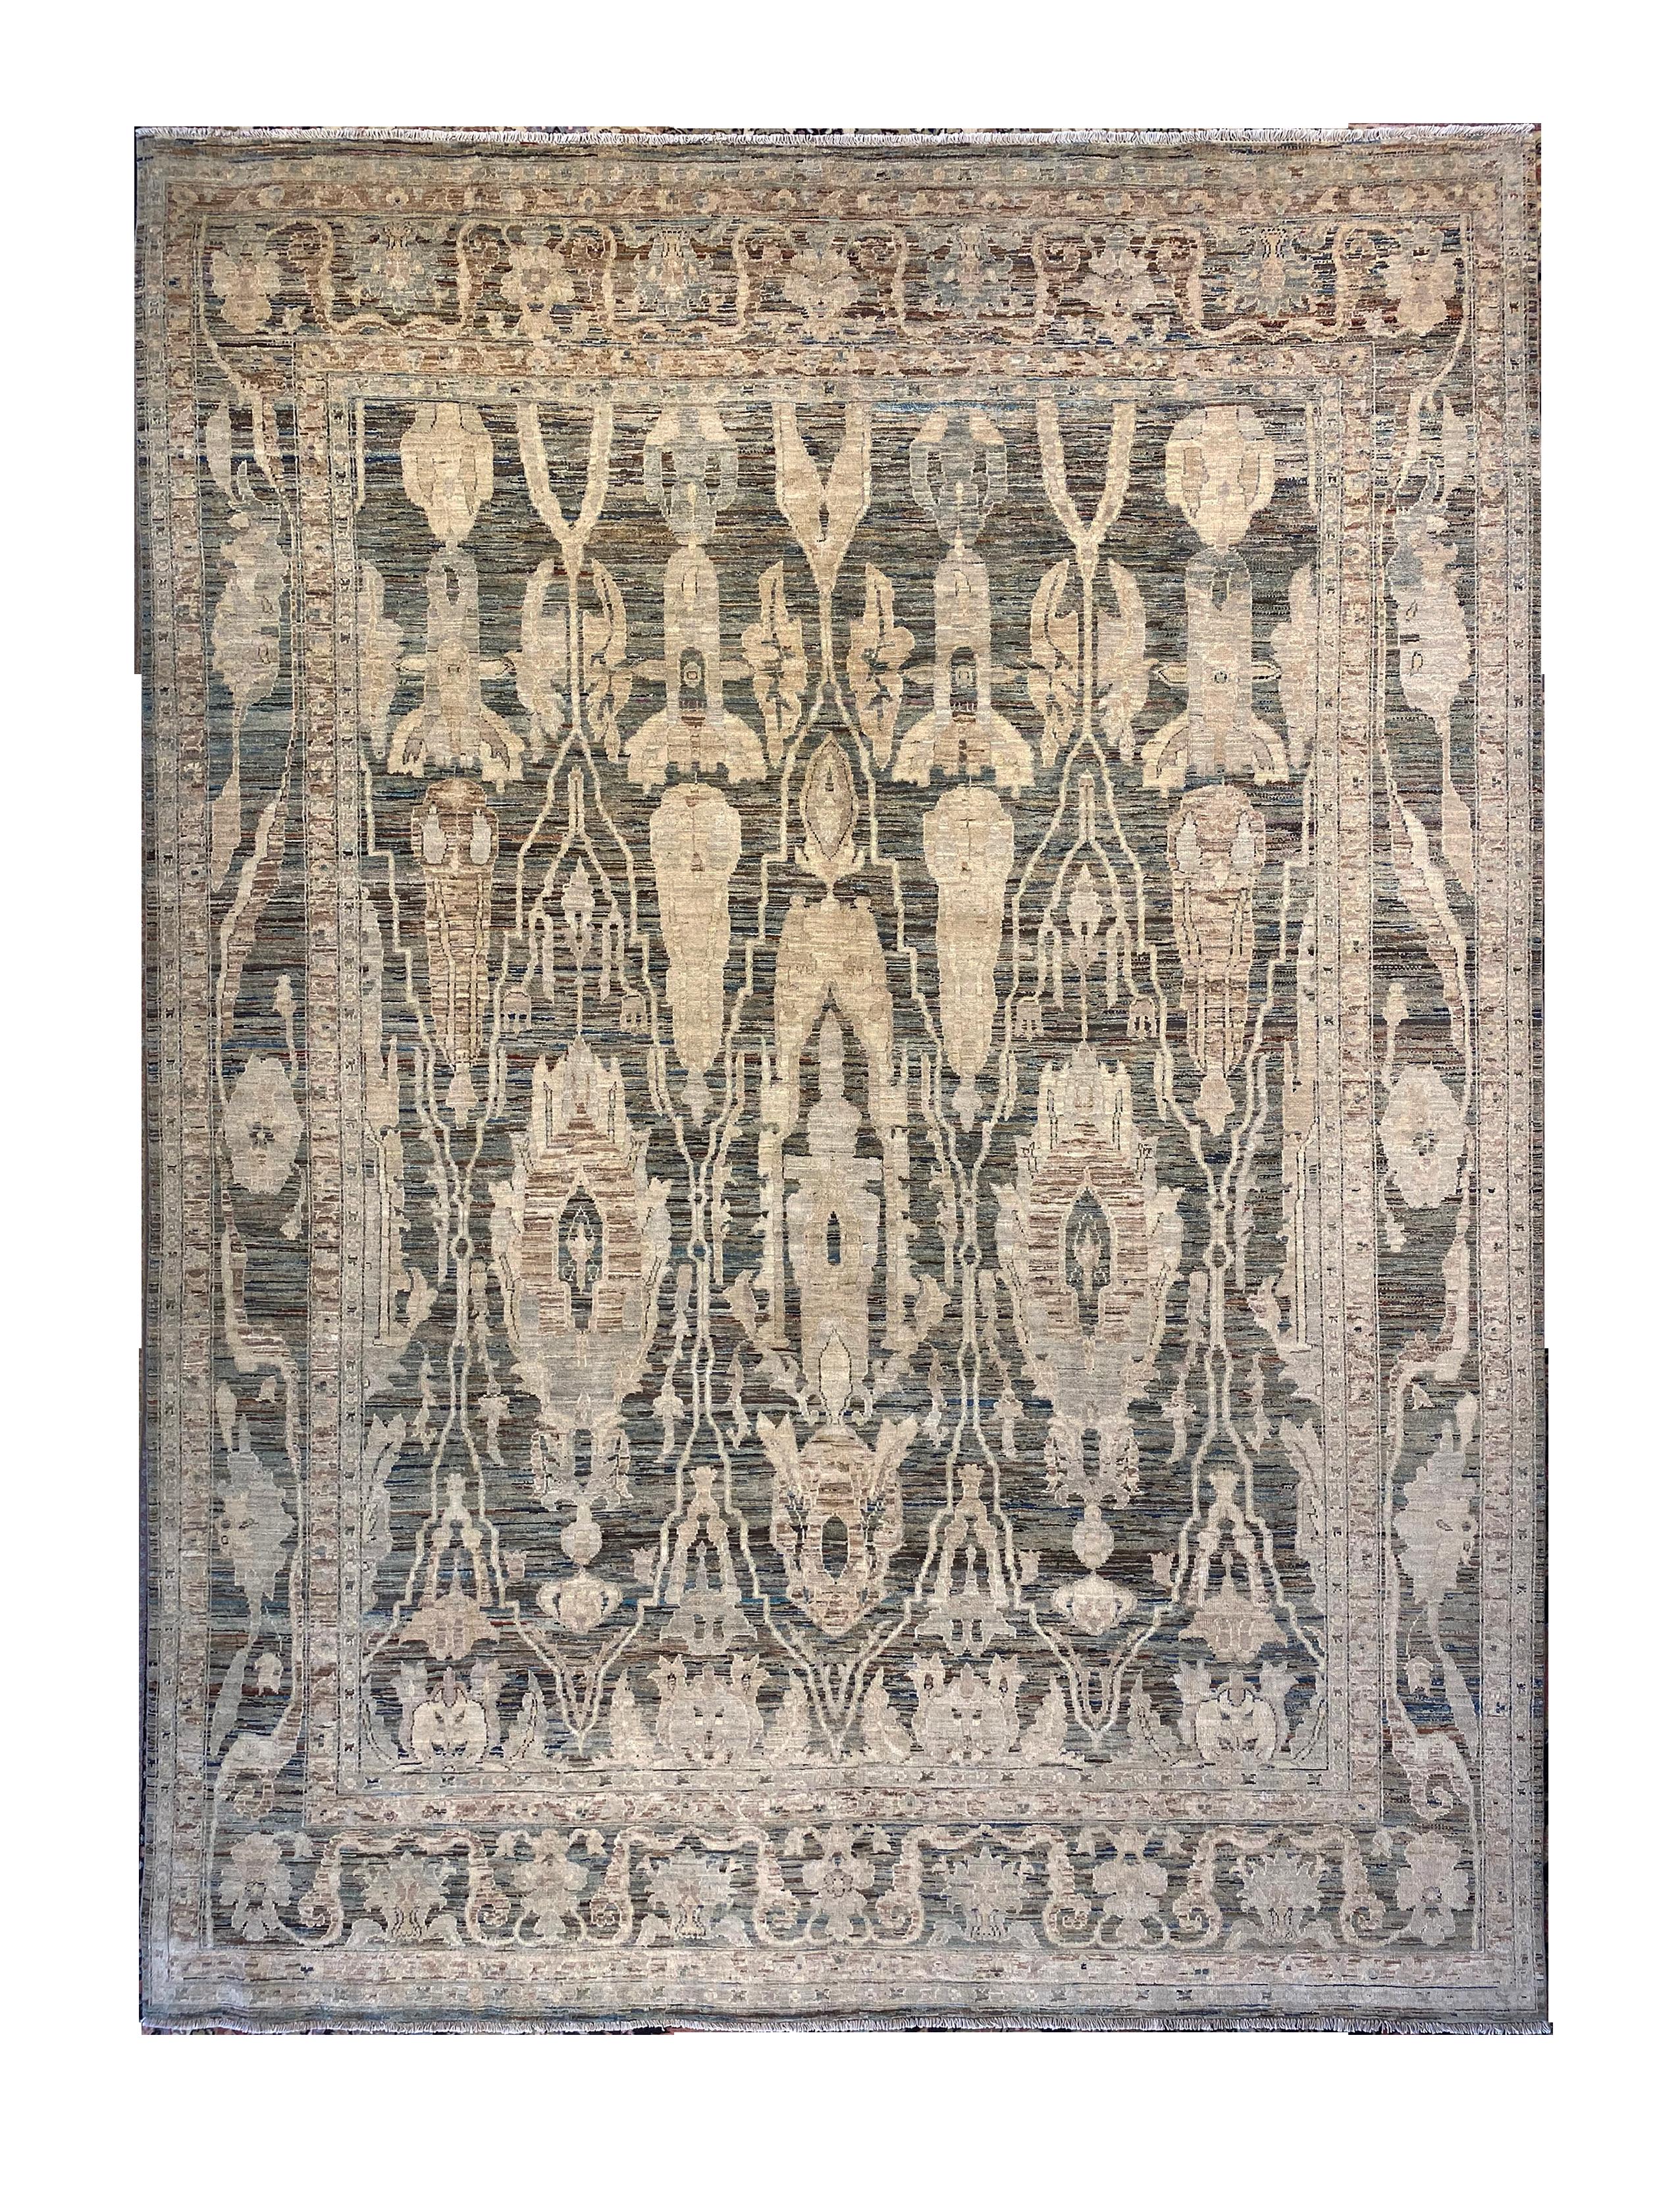 "Modern Oushak 9' 7"" x 12' 9"" Handmade Area Rug - Shabahang Royal Carpet"